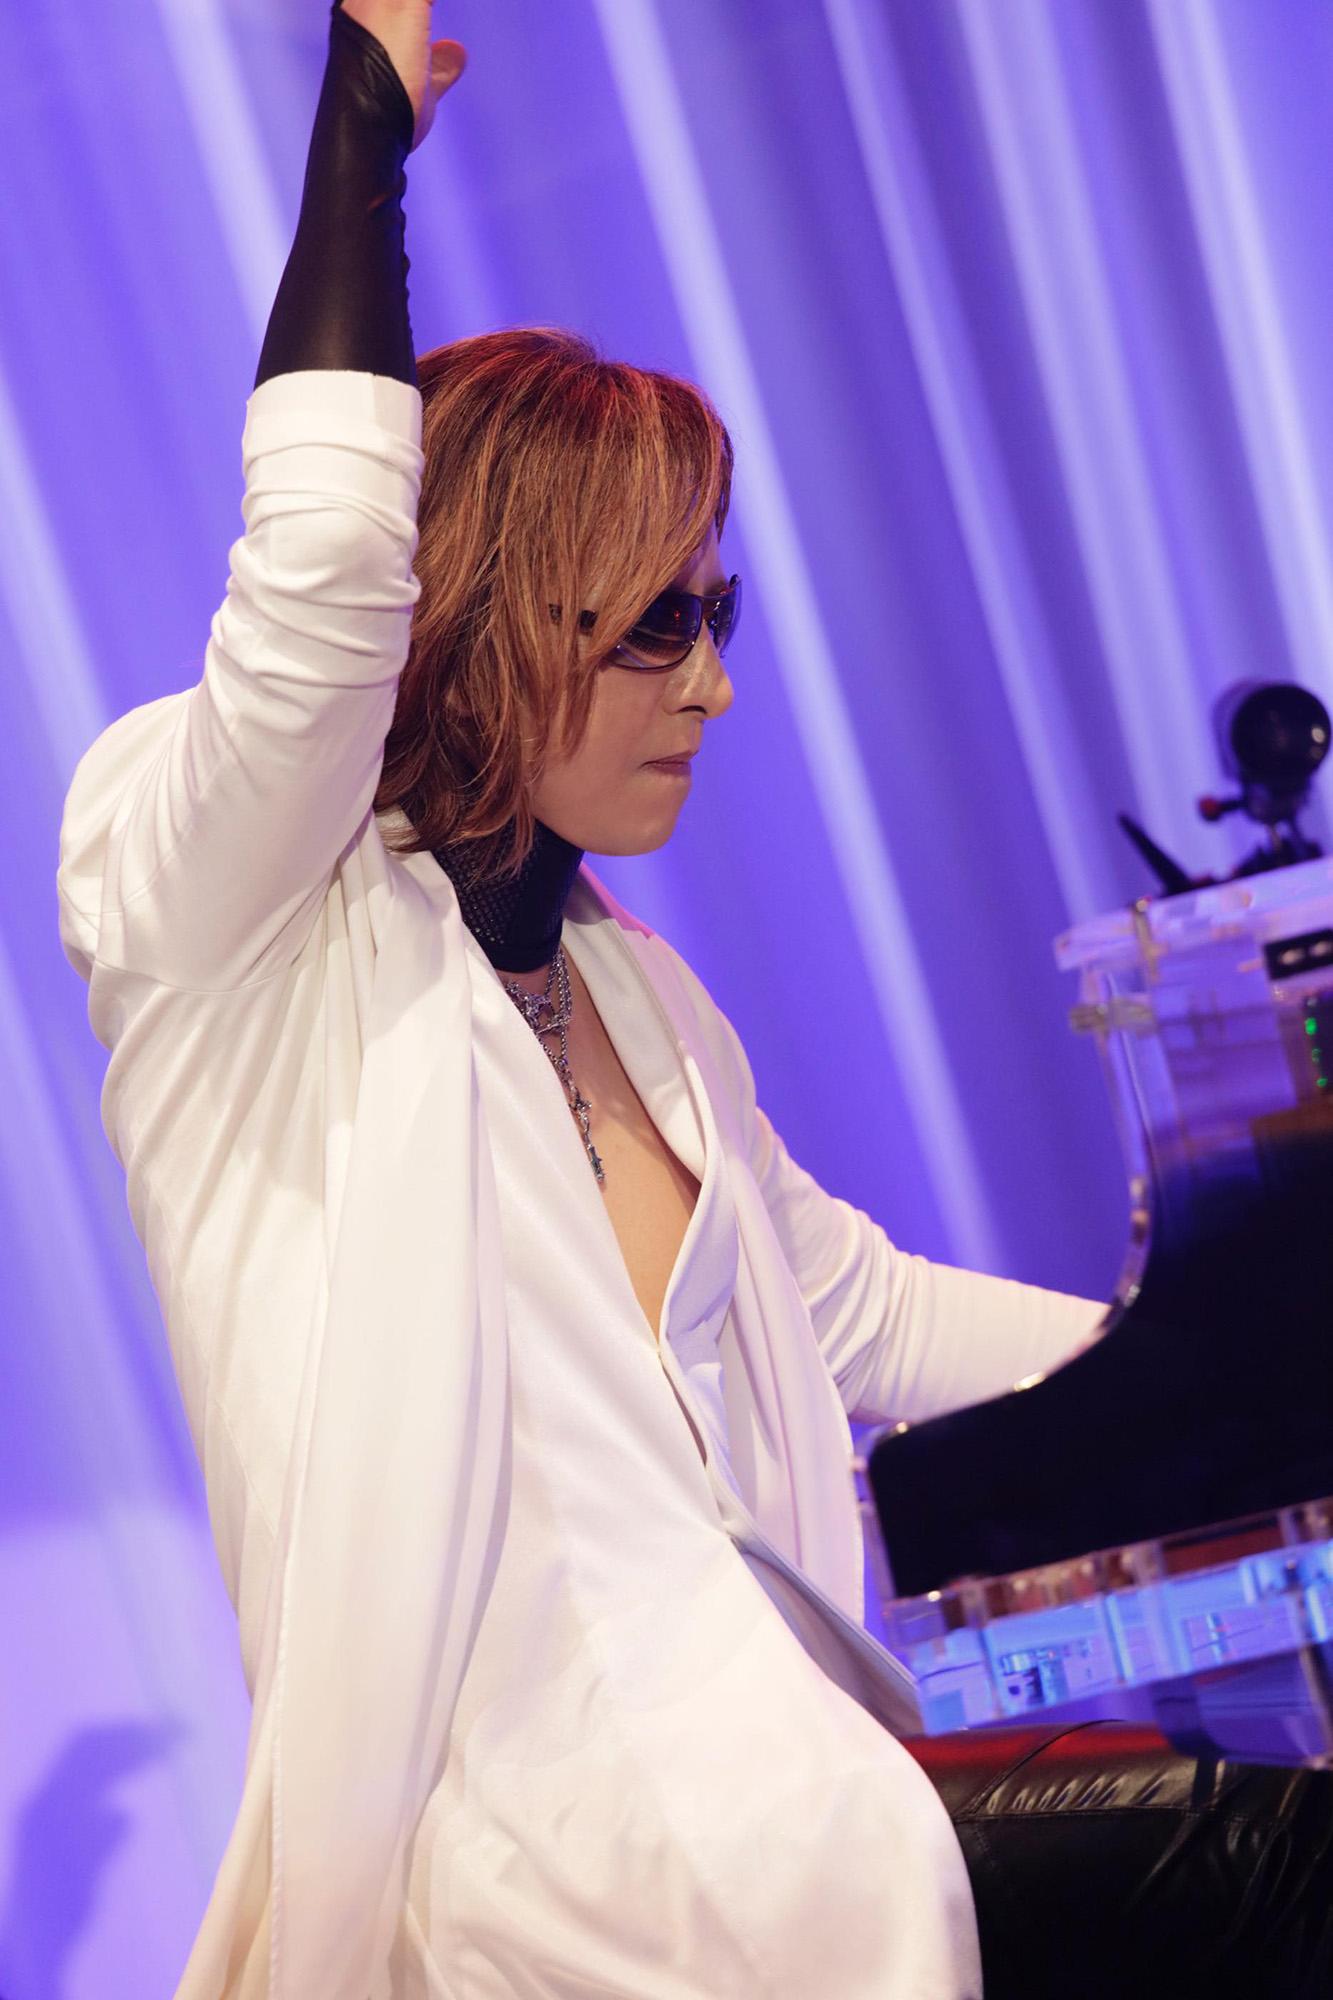 RMMS-Yoshiki-Dinner-Show-Tokyo-20170902-M3337